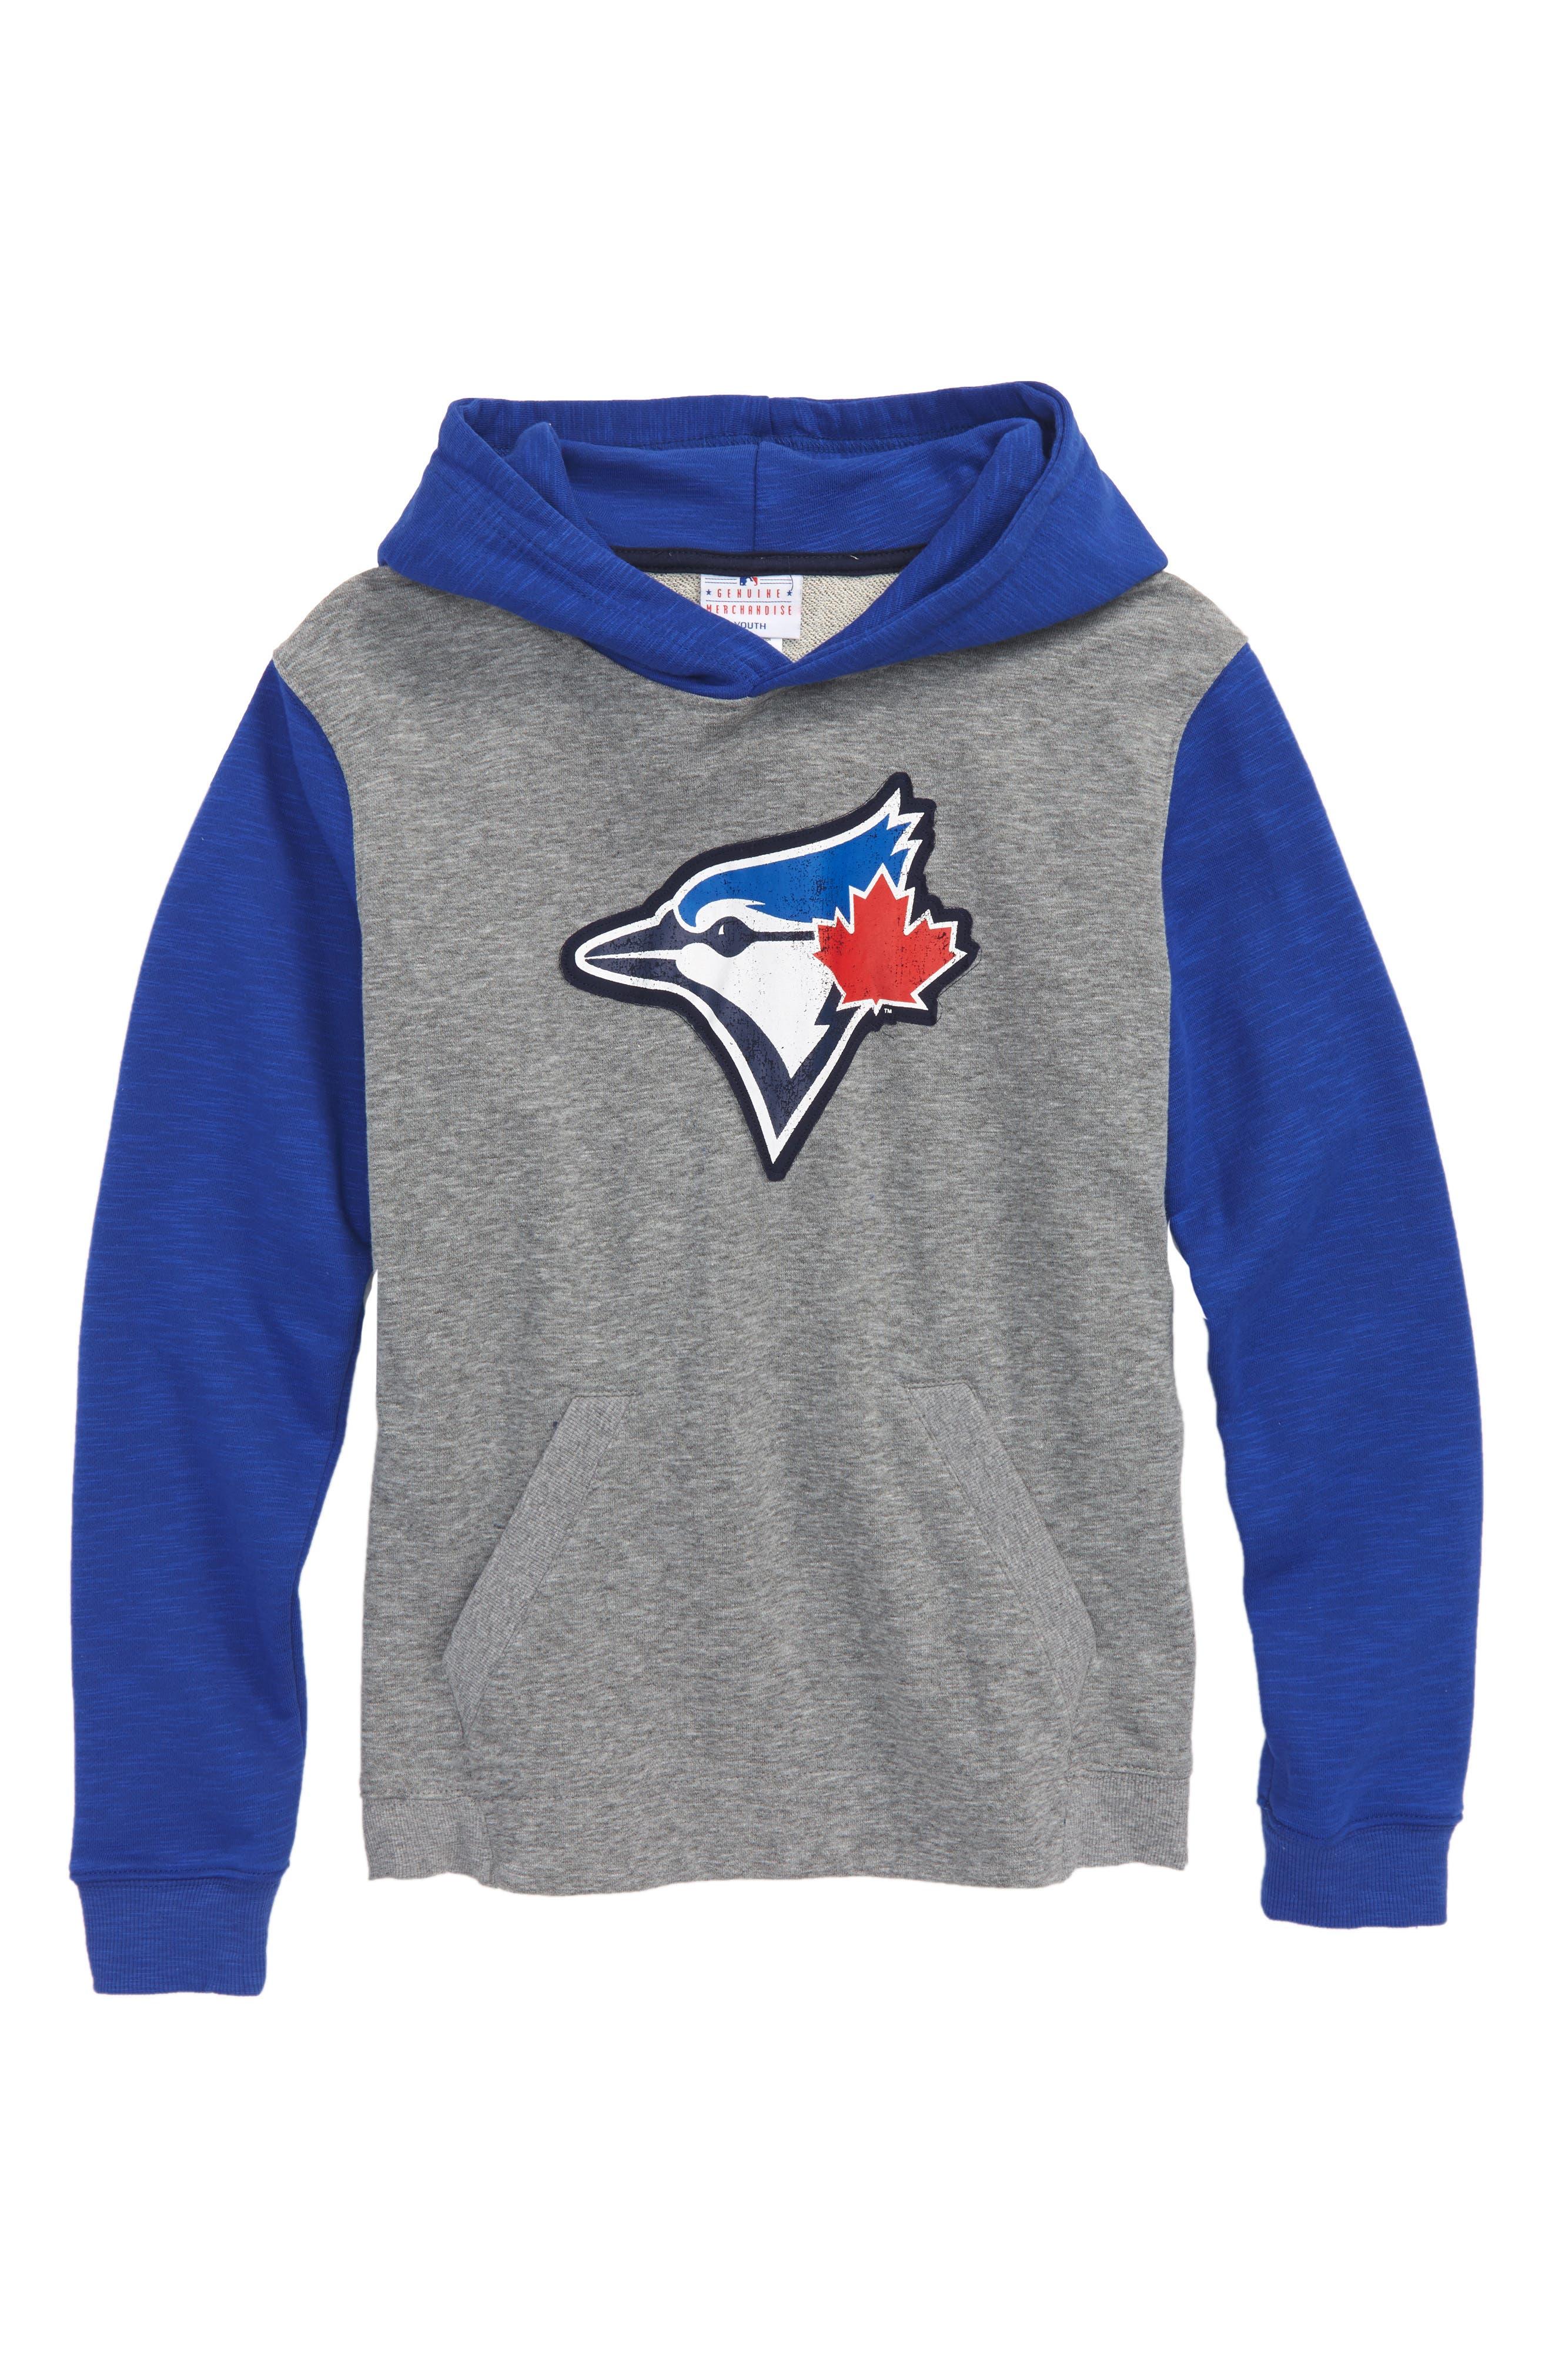 New Beginnings - Toronto Blue Jays Pullover Hoodie,                         Main,                         color,